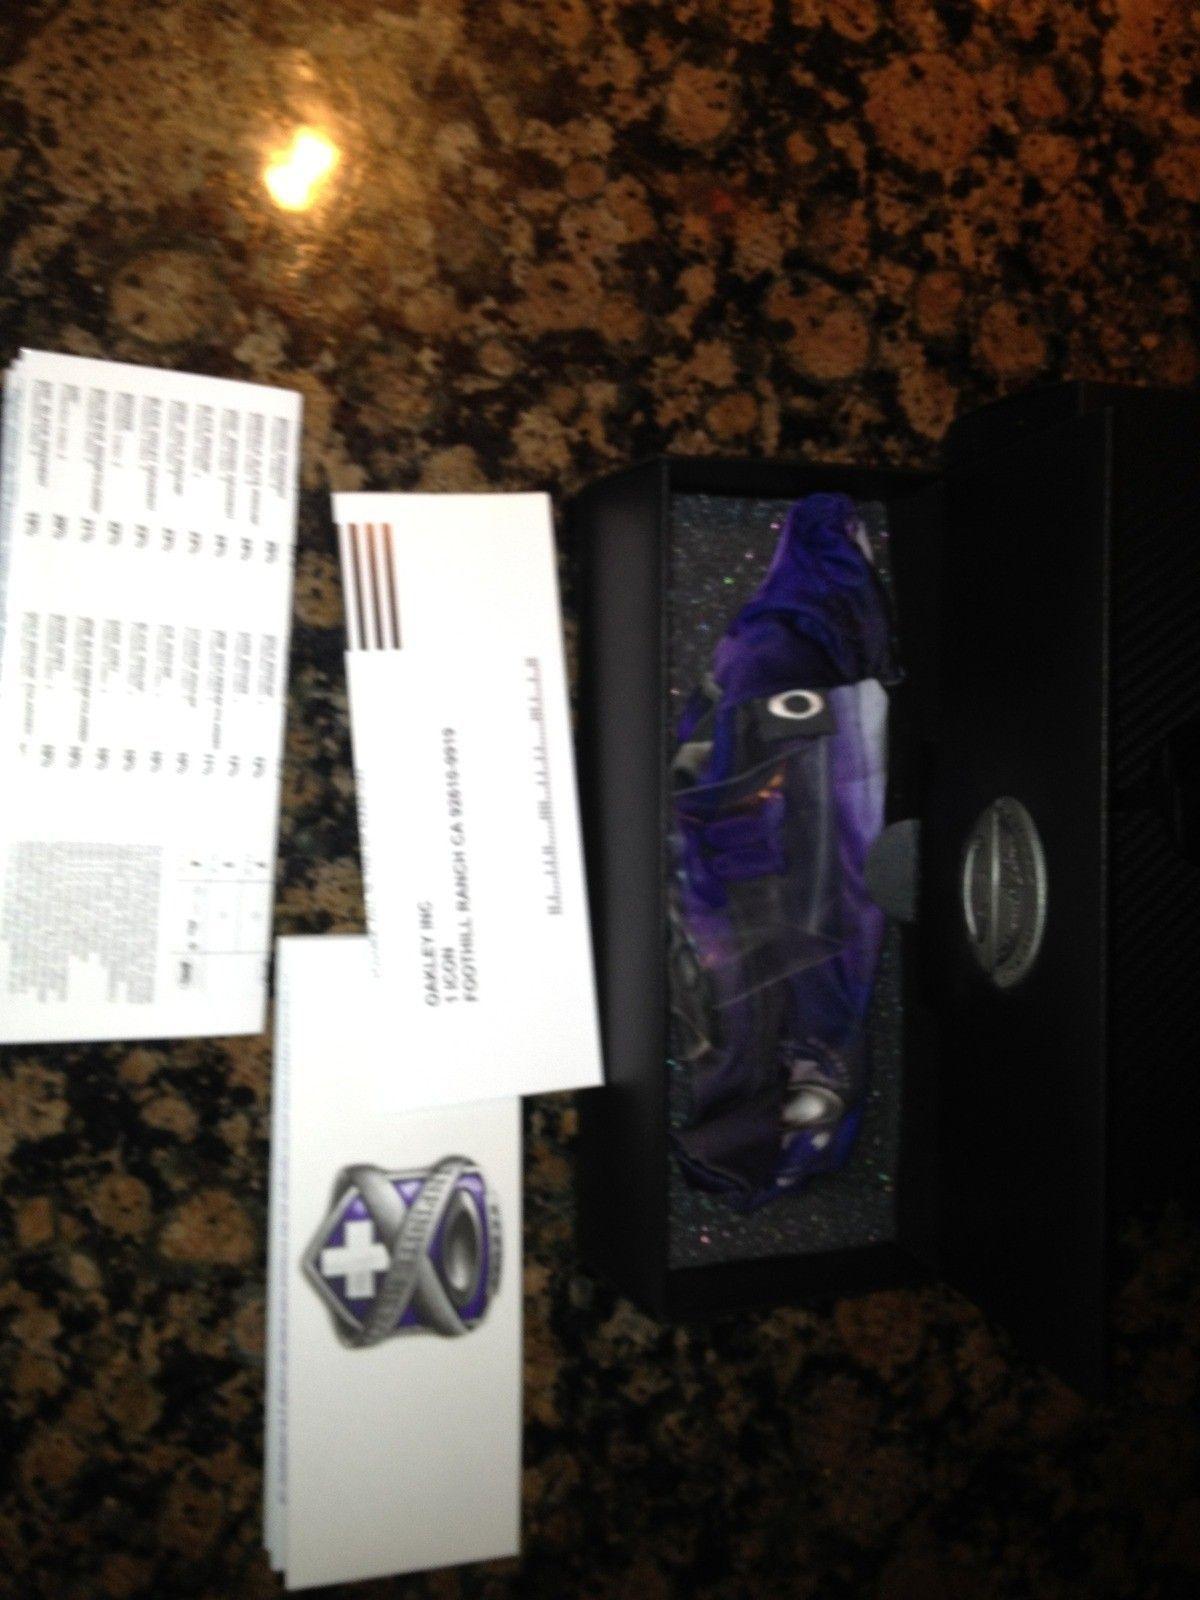 IH Juliet 325 Shipped USA - TNBGcv1O_original.jpg